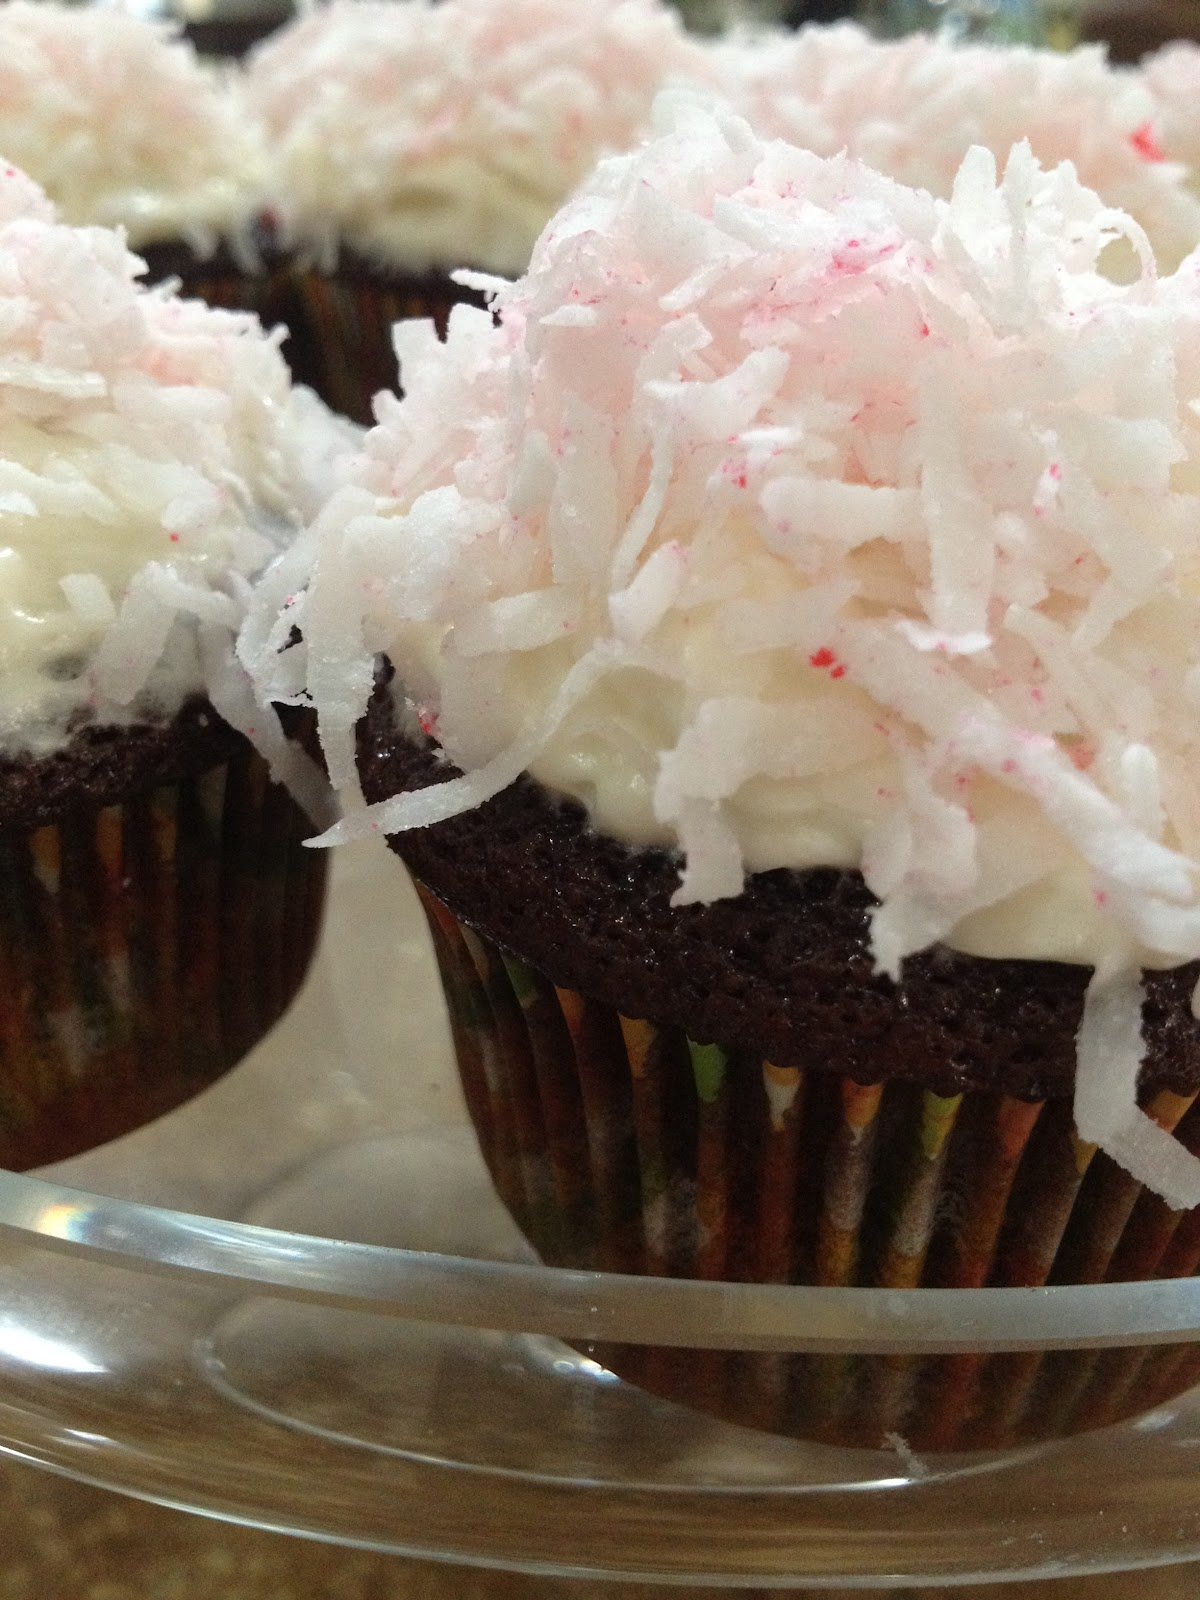 Pinkies Chocolate Lunch-Box Treats Recipes — Dishmaps